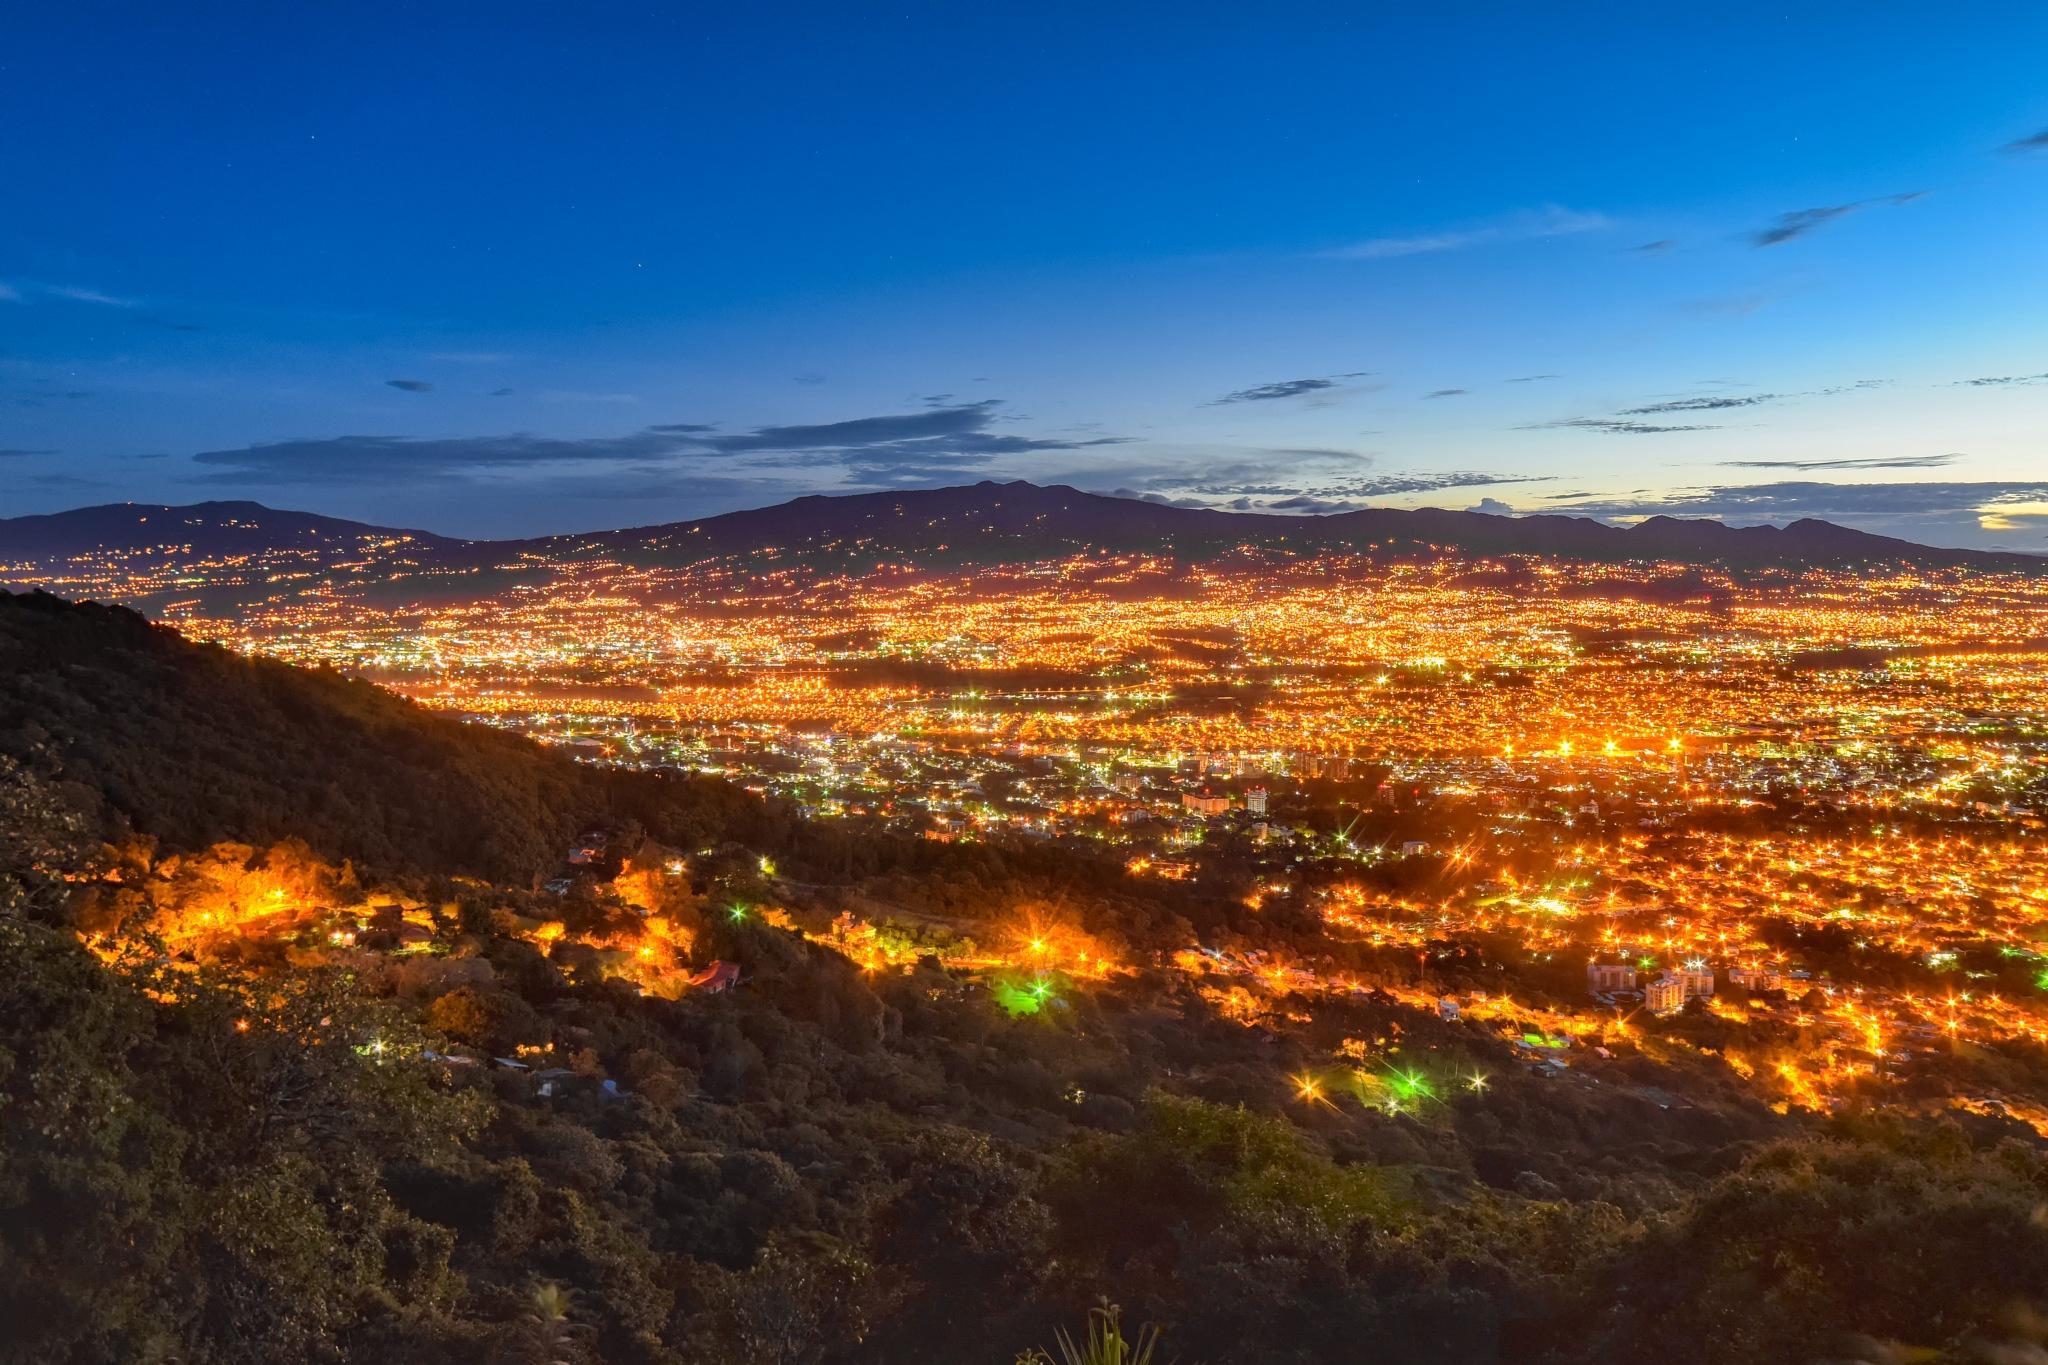 Dawning on the city by JaribFoto